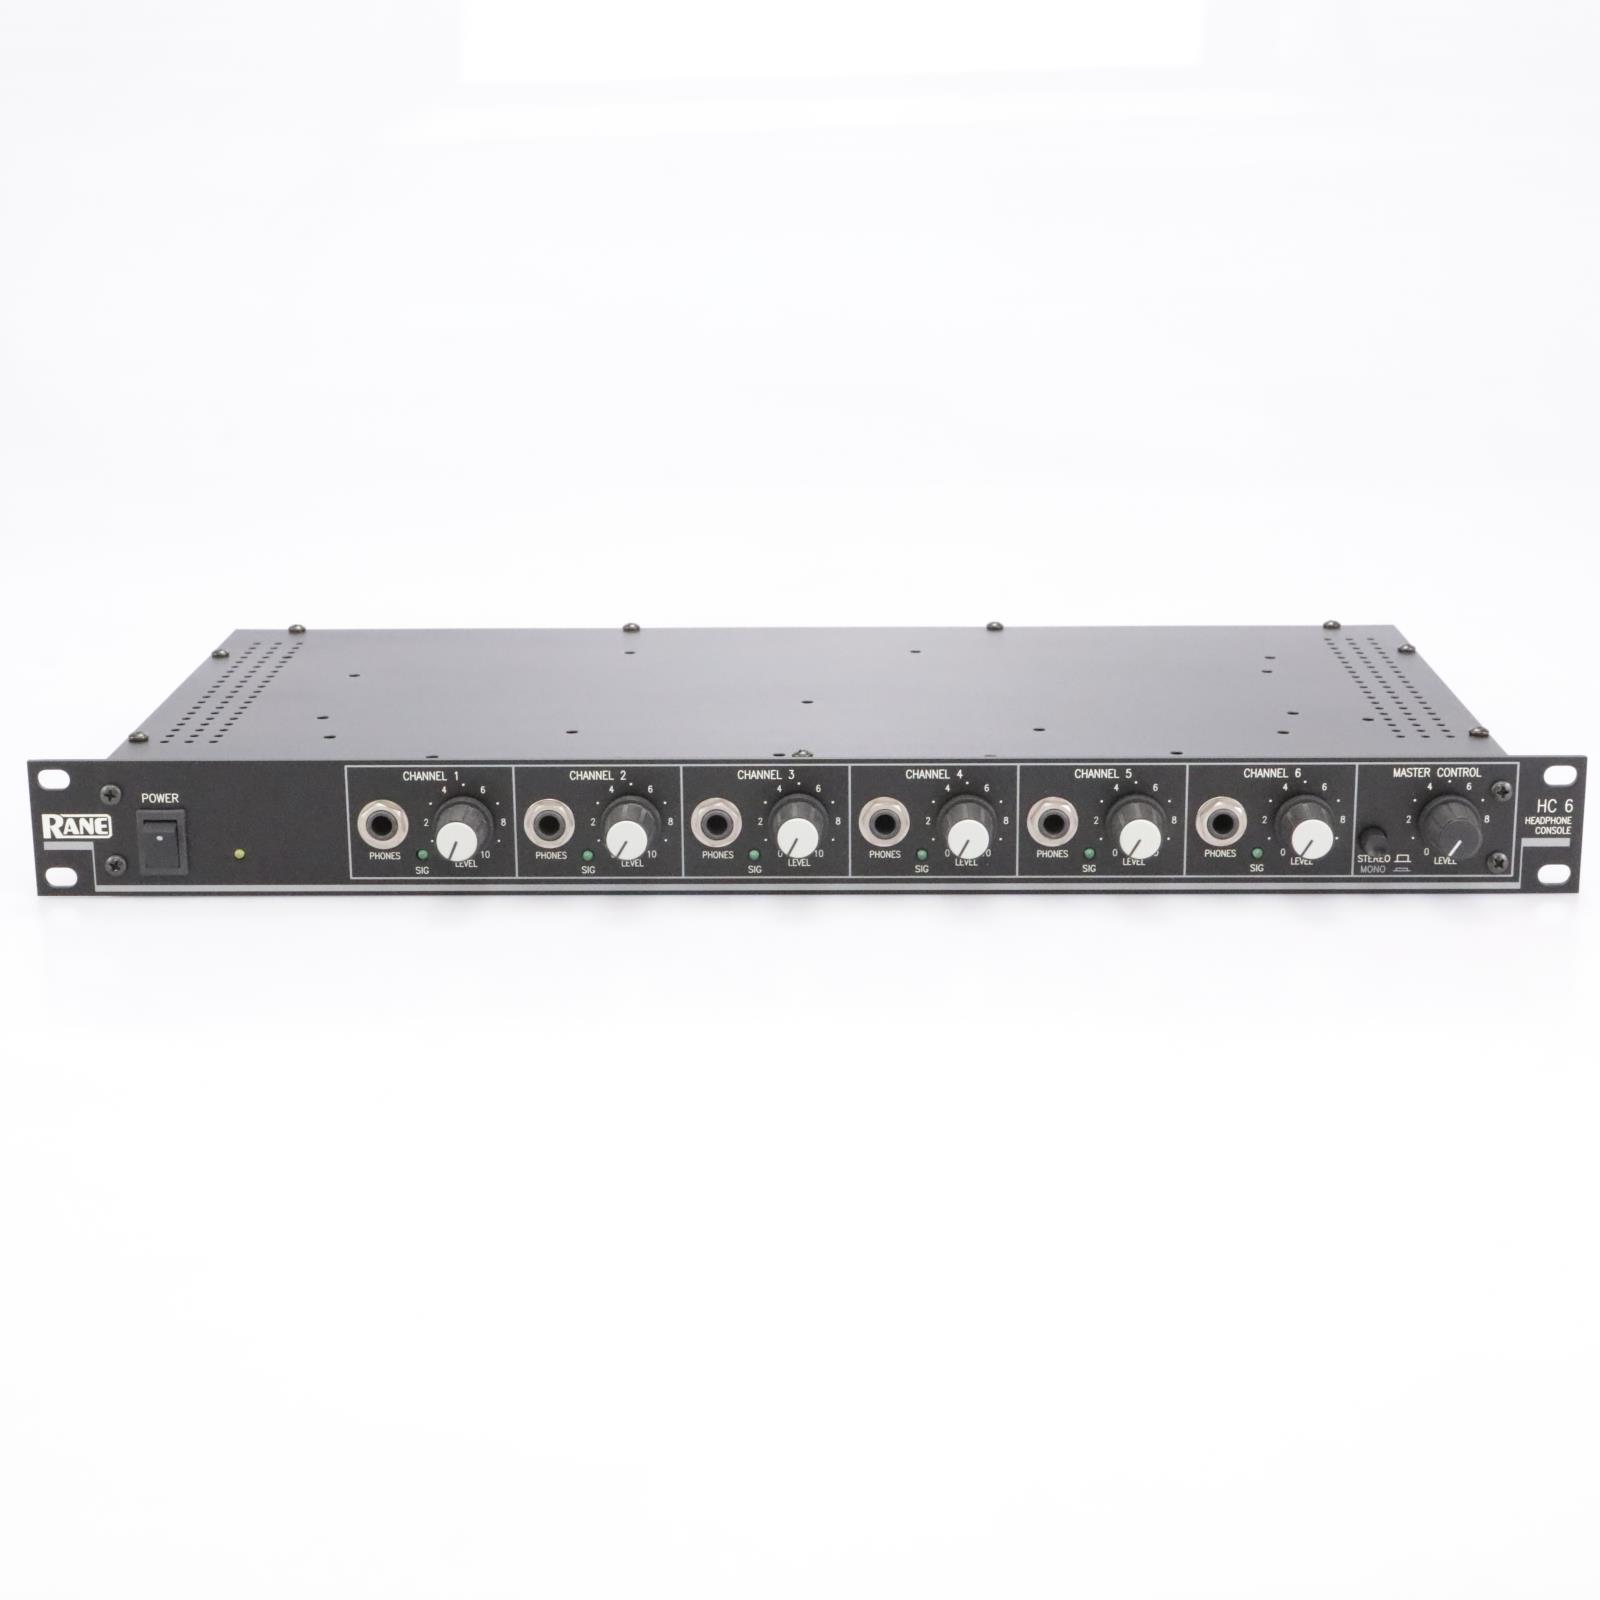 Rane HC-6 6-Channel Stereo Headphone Amplifier / Distributer #43448